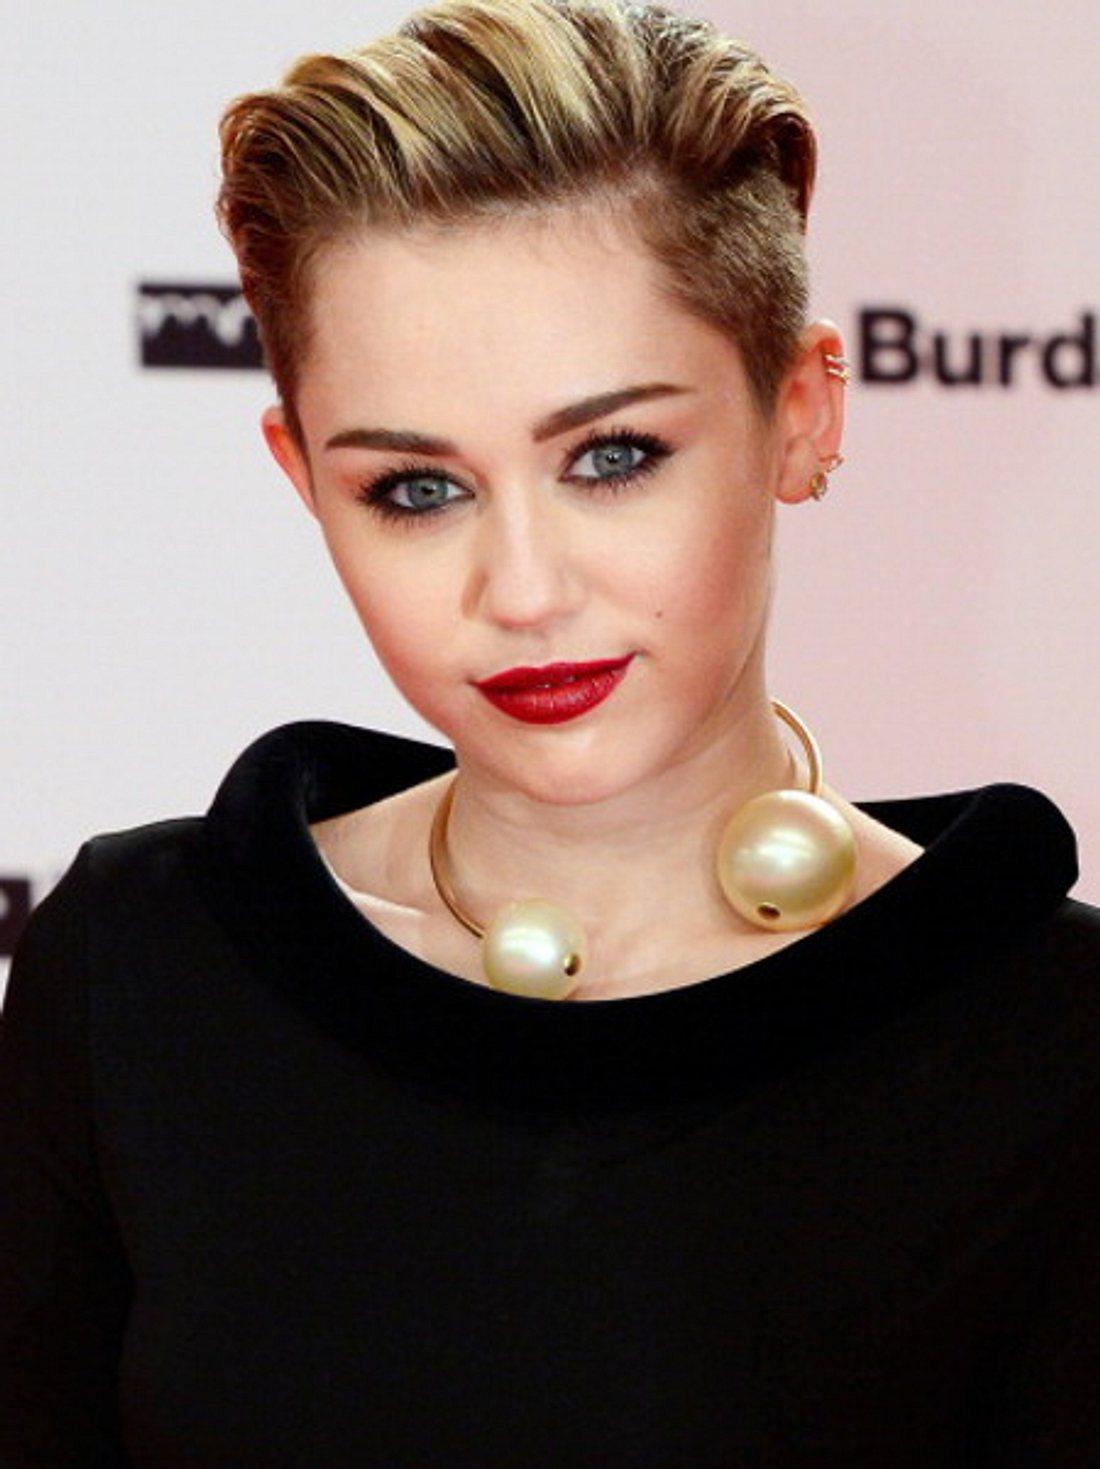 Miley Cyrus: Mega-Zoff mit Jennifer Lawrence?